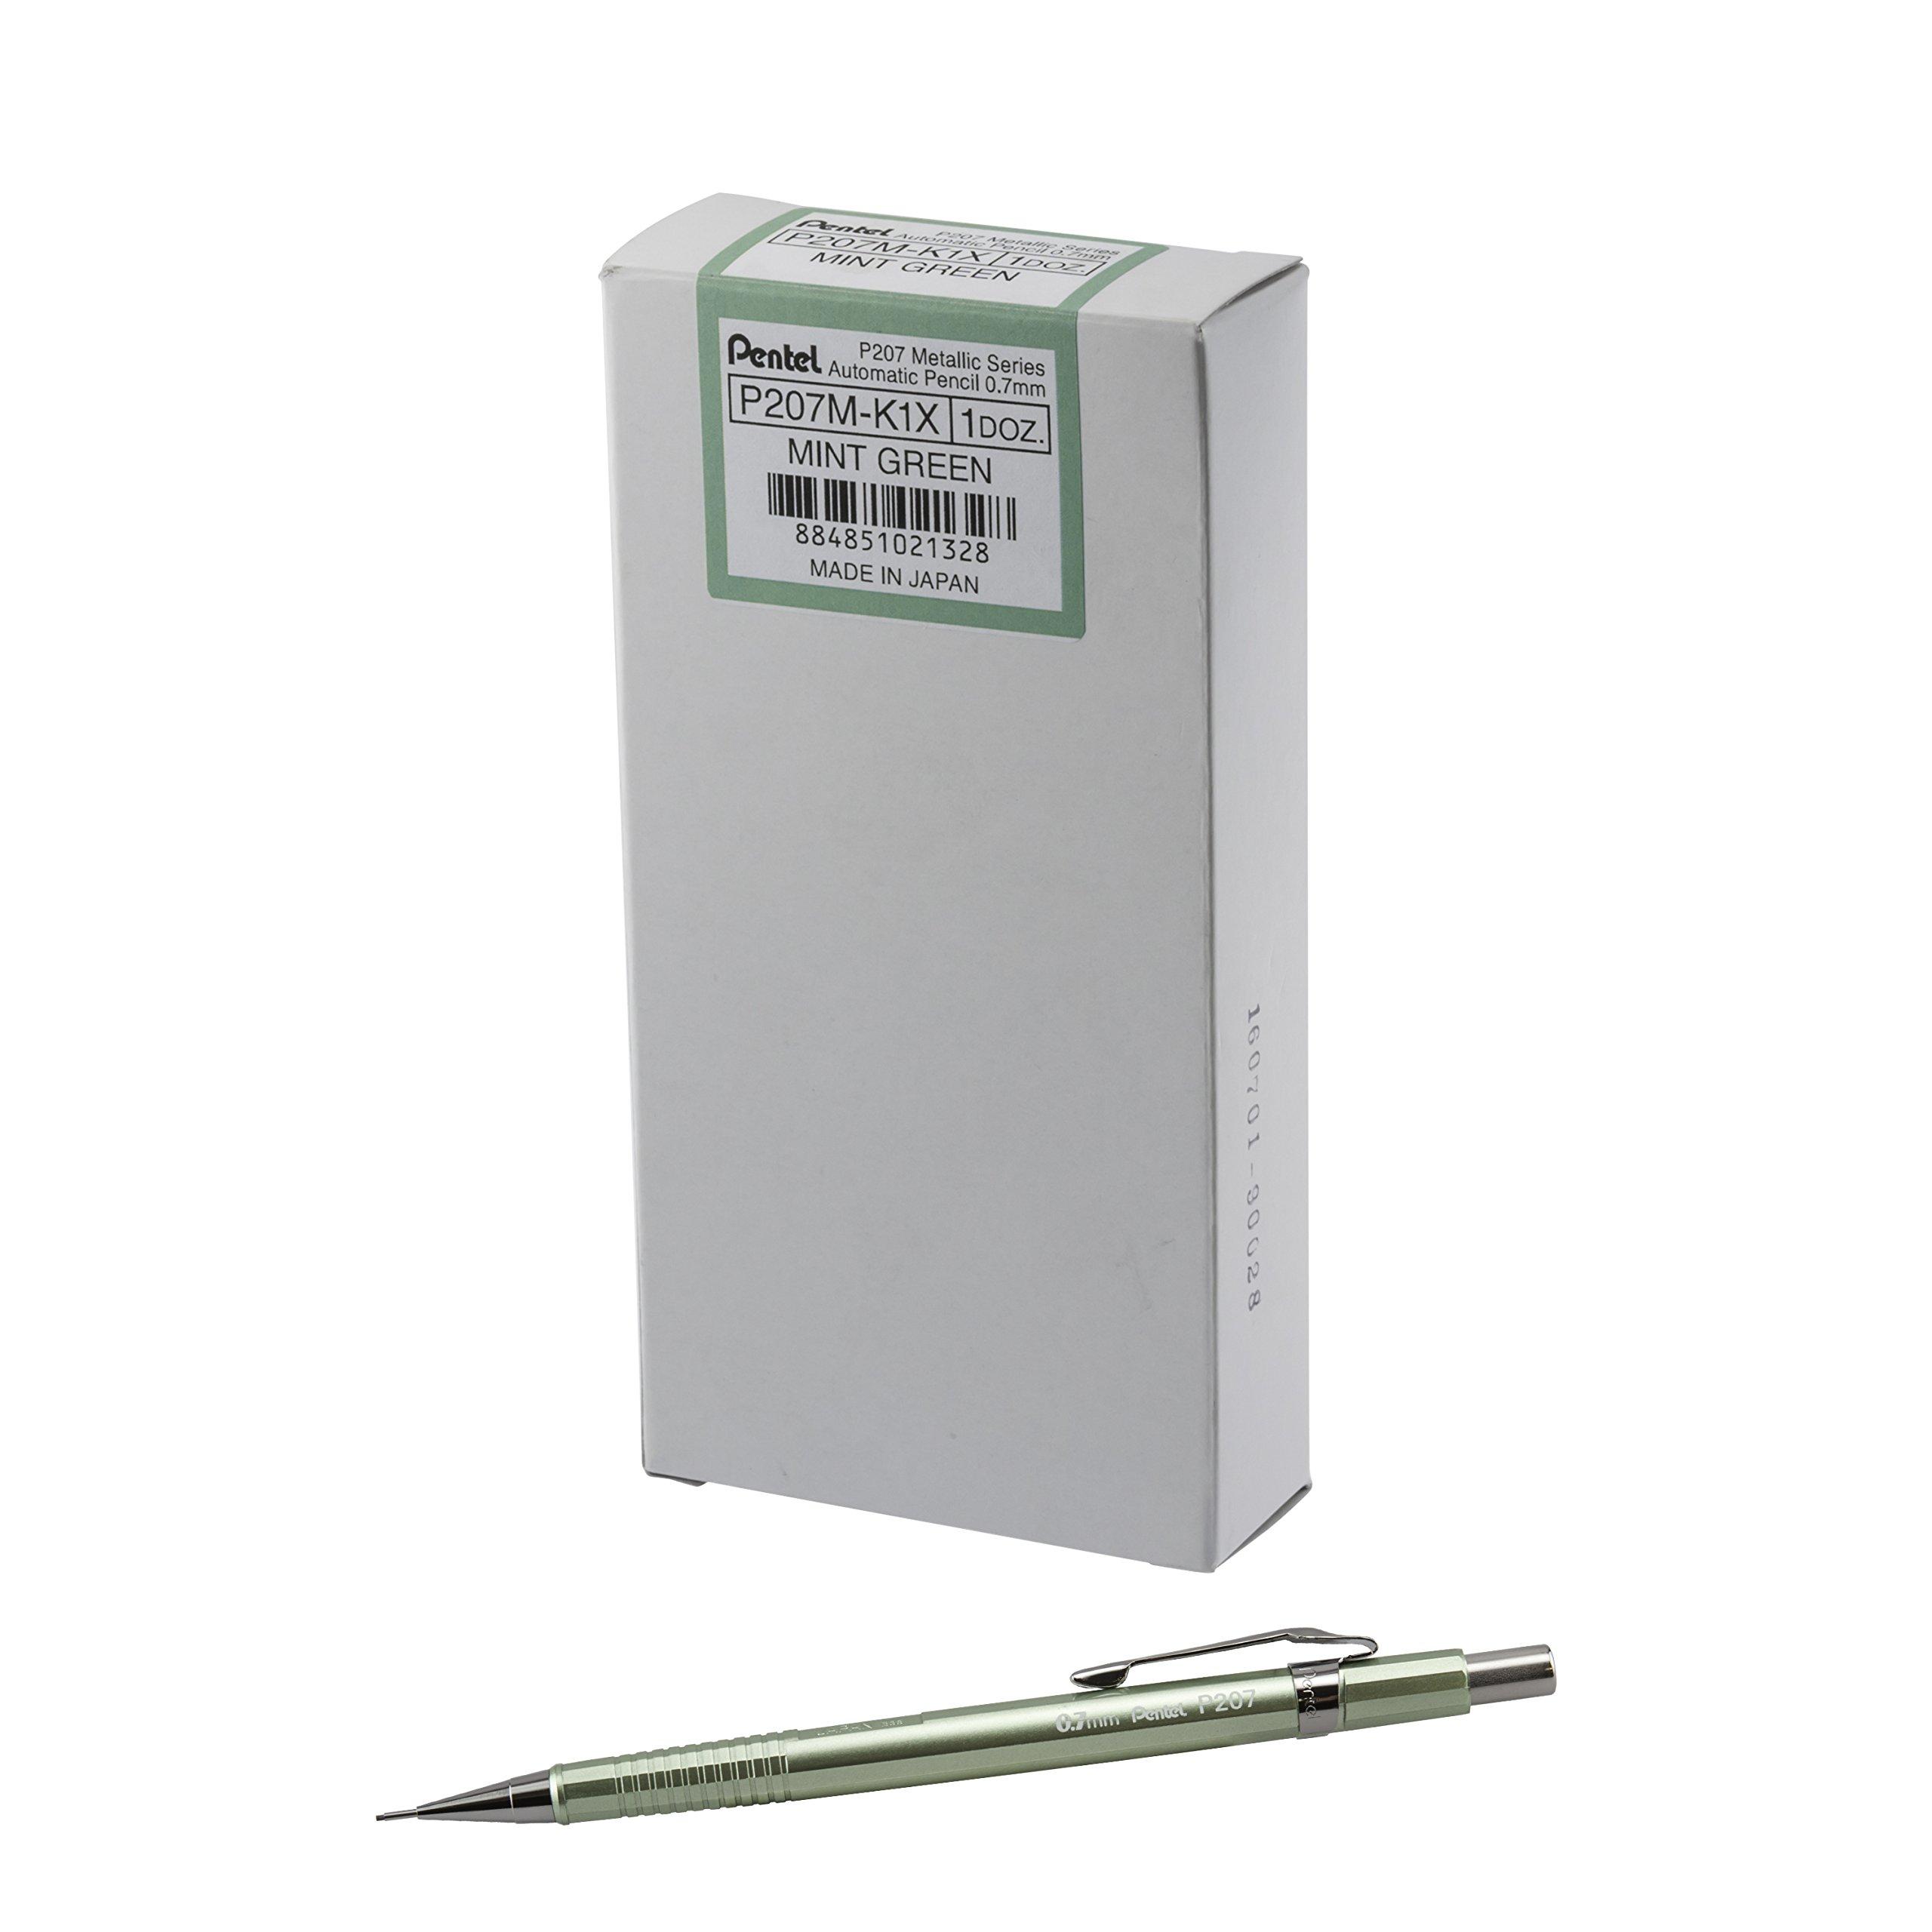 Portaminas 0.7mm Pentel.e-sharp Metallic Celadon x12